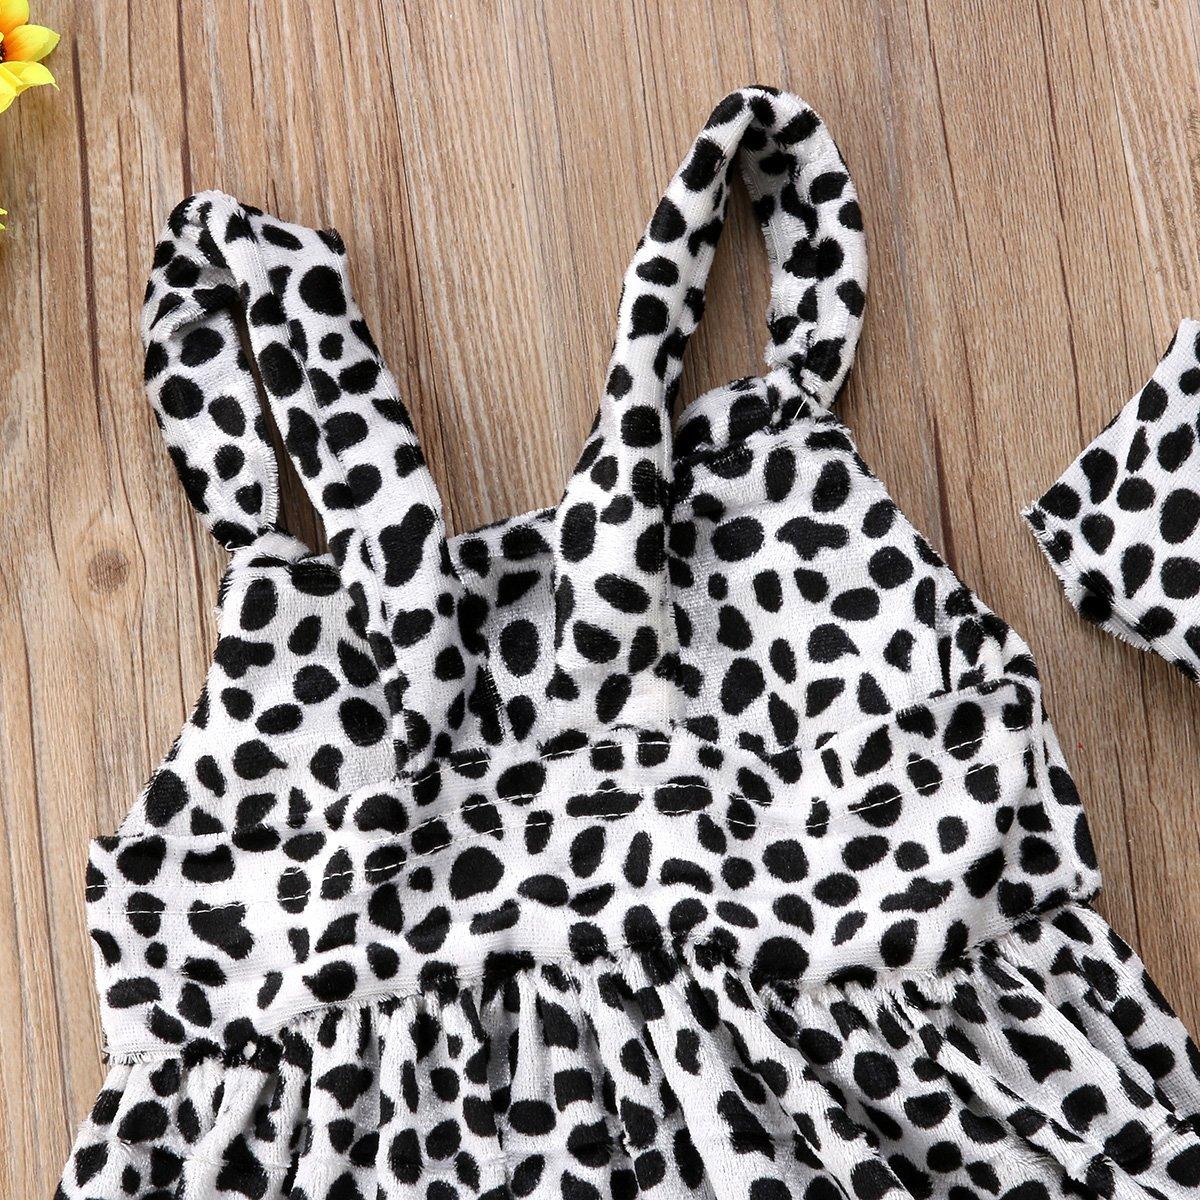 715c9136e ... Do co-sport Baby Cute Milk Summer Jumpsuits for Girls Kids Harem Strap  Romper Jumpsuit ...